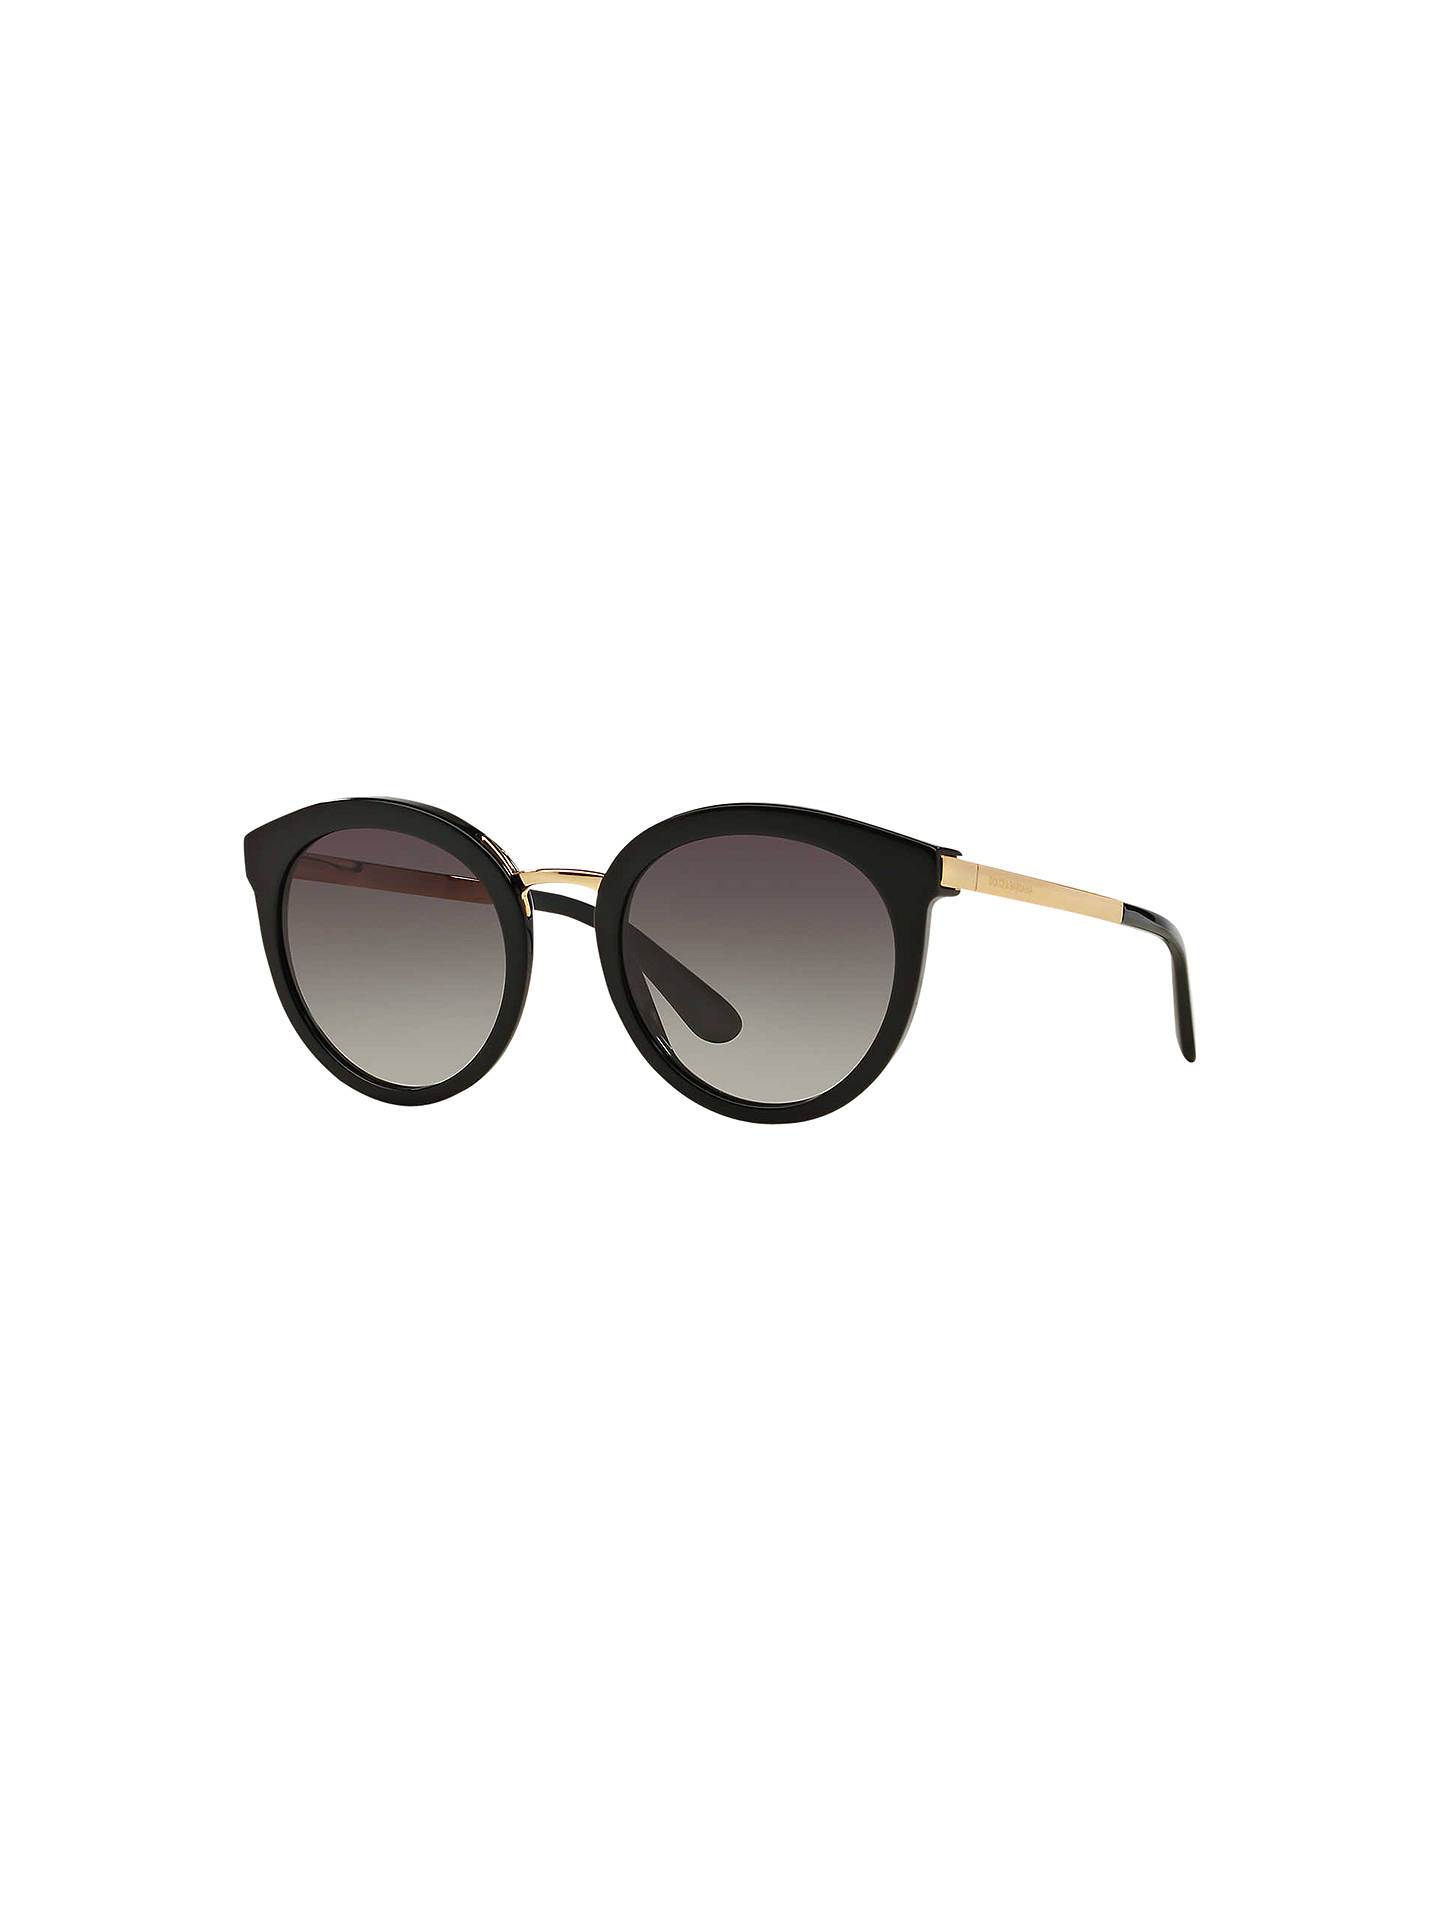 b5639809b51 Dolce   Gabbana DG4268 Round Sunglasses at John Lewis   Partners